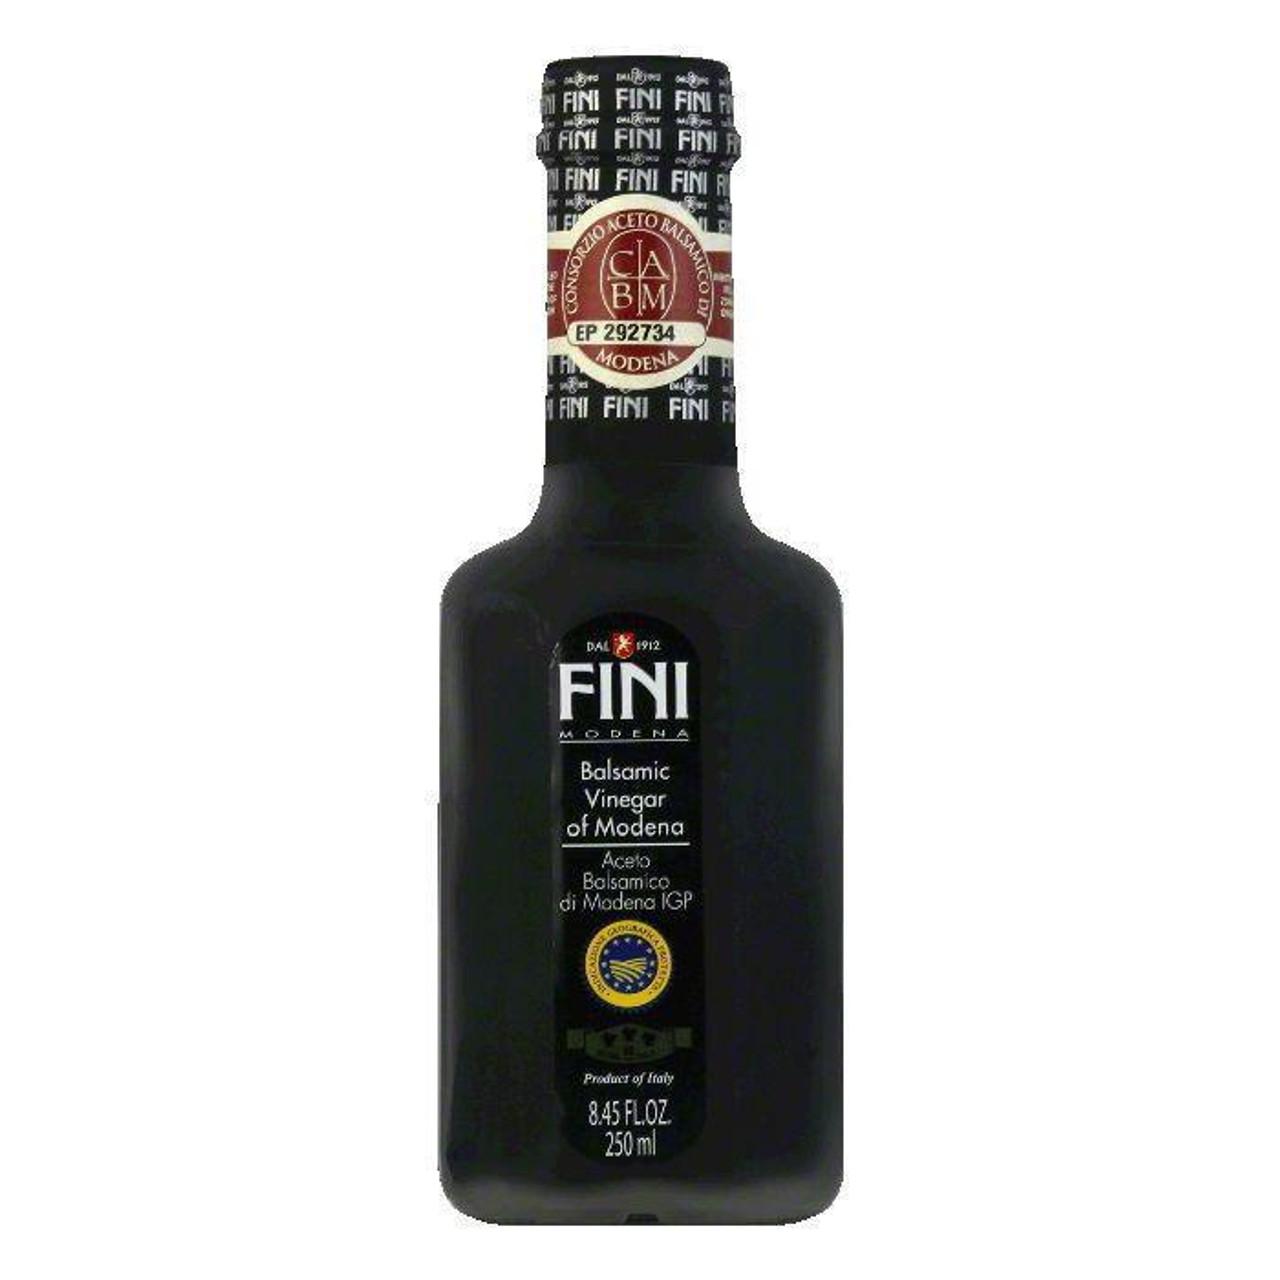 Fini 6 yr. Balsamic Vinegar